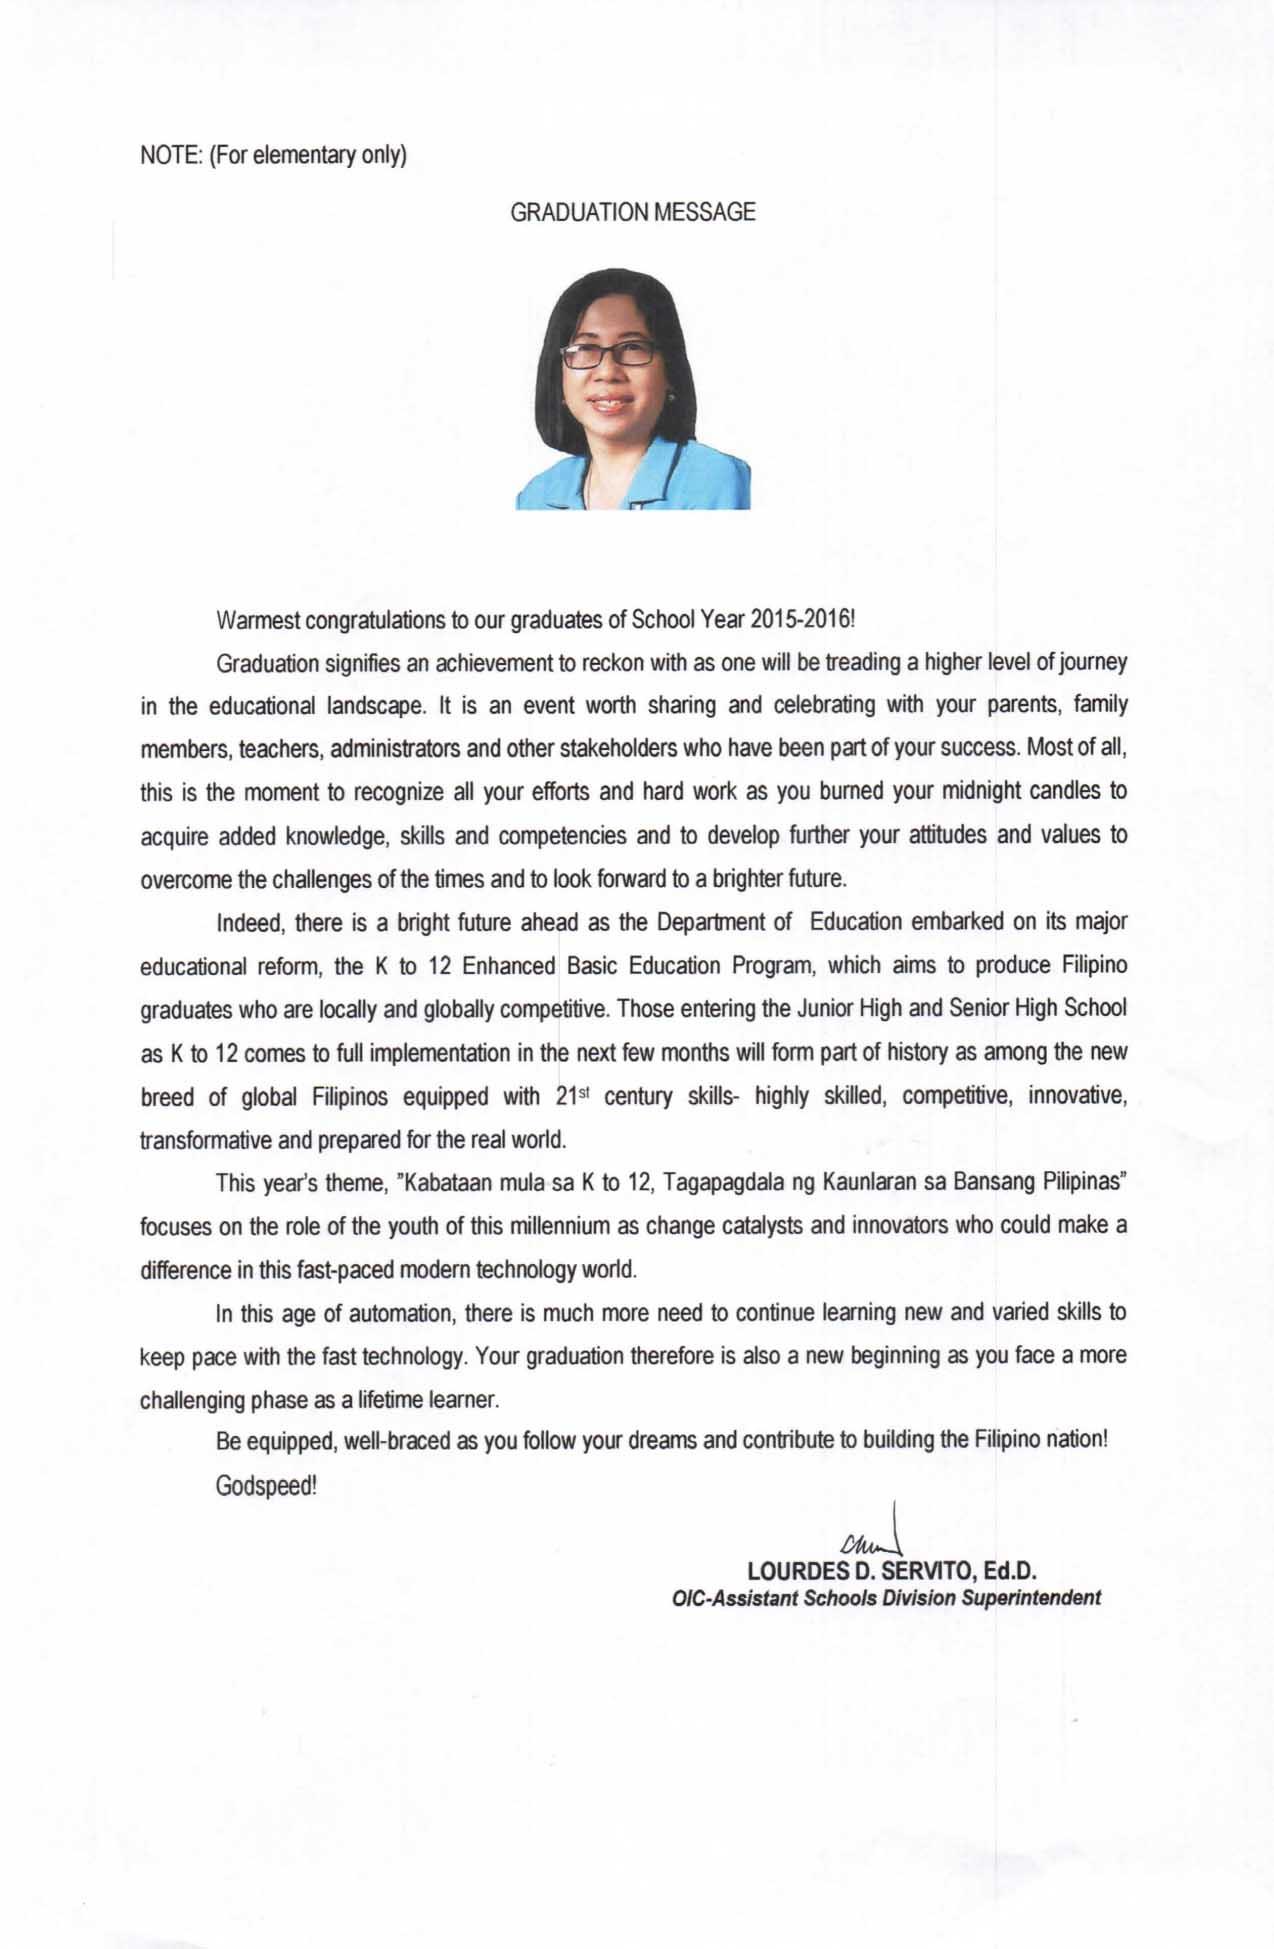 2016 graduation message of lourdes d servito teacherph 2016 graduation message of lourdes d servito elementary m4hsunfo